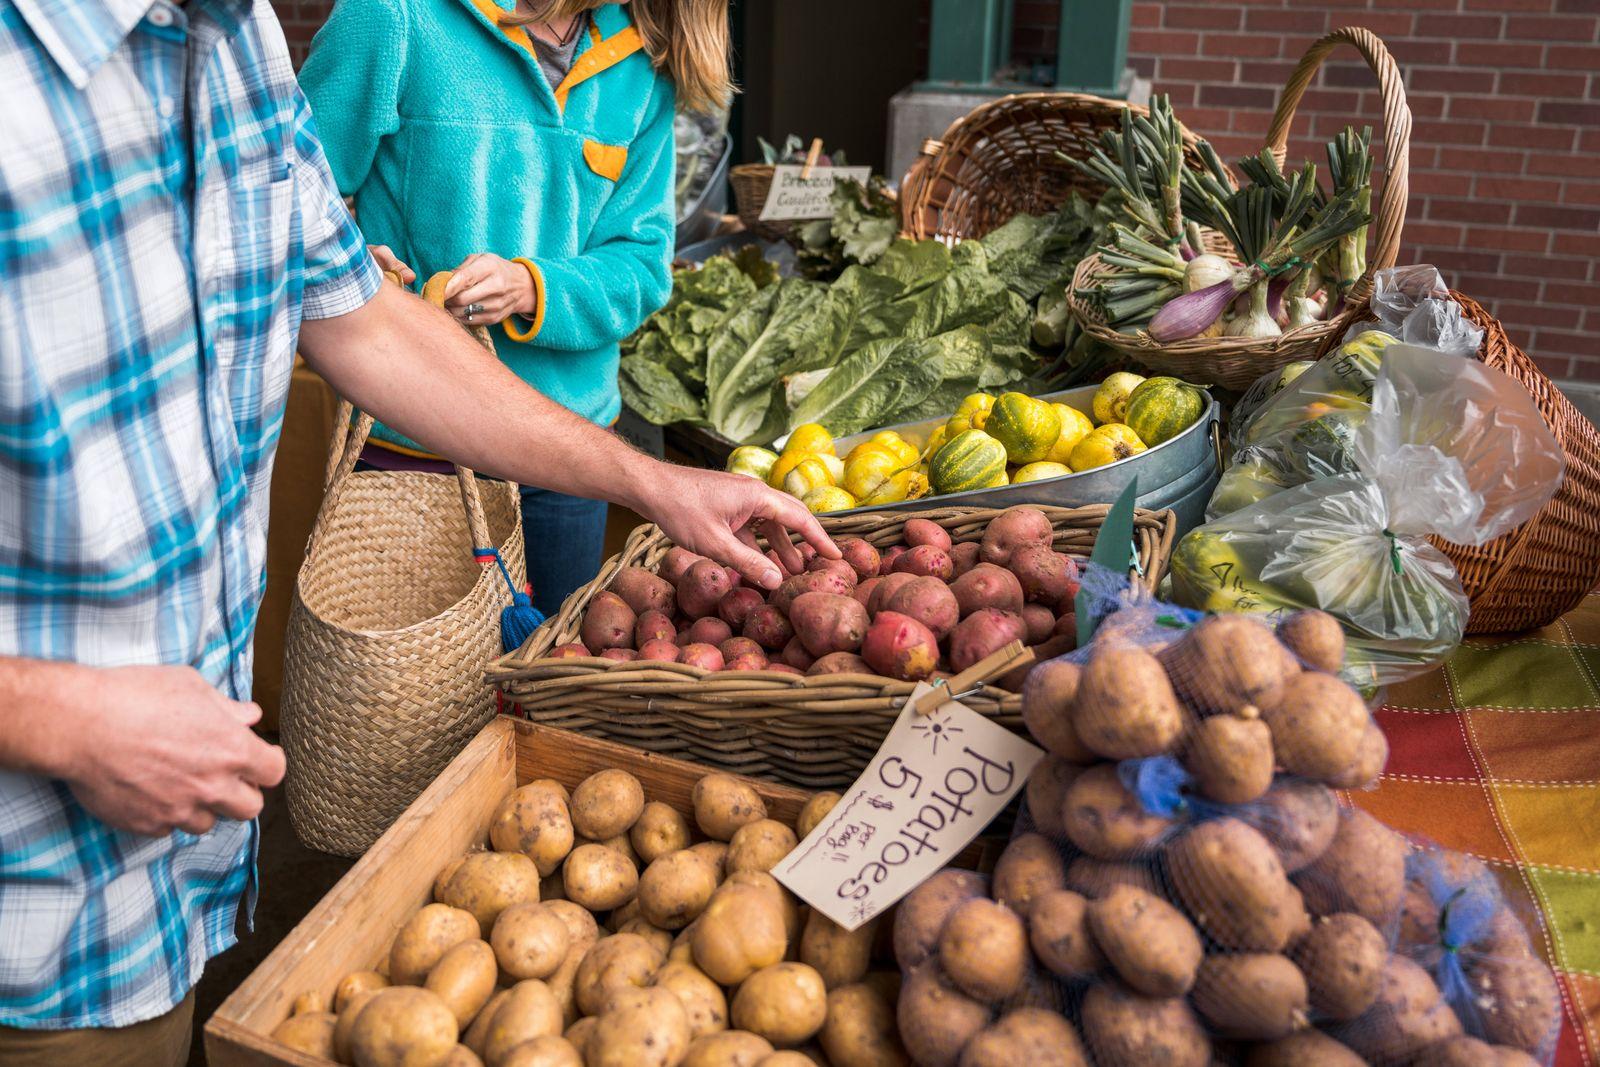 Man and woman gather potatoes at farmers market Port Angeles, WA, United States PUBLICATIONxINxGERxSUIxAUTxONLY CR_ADMC